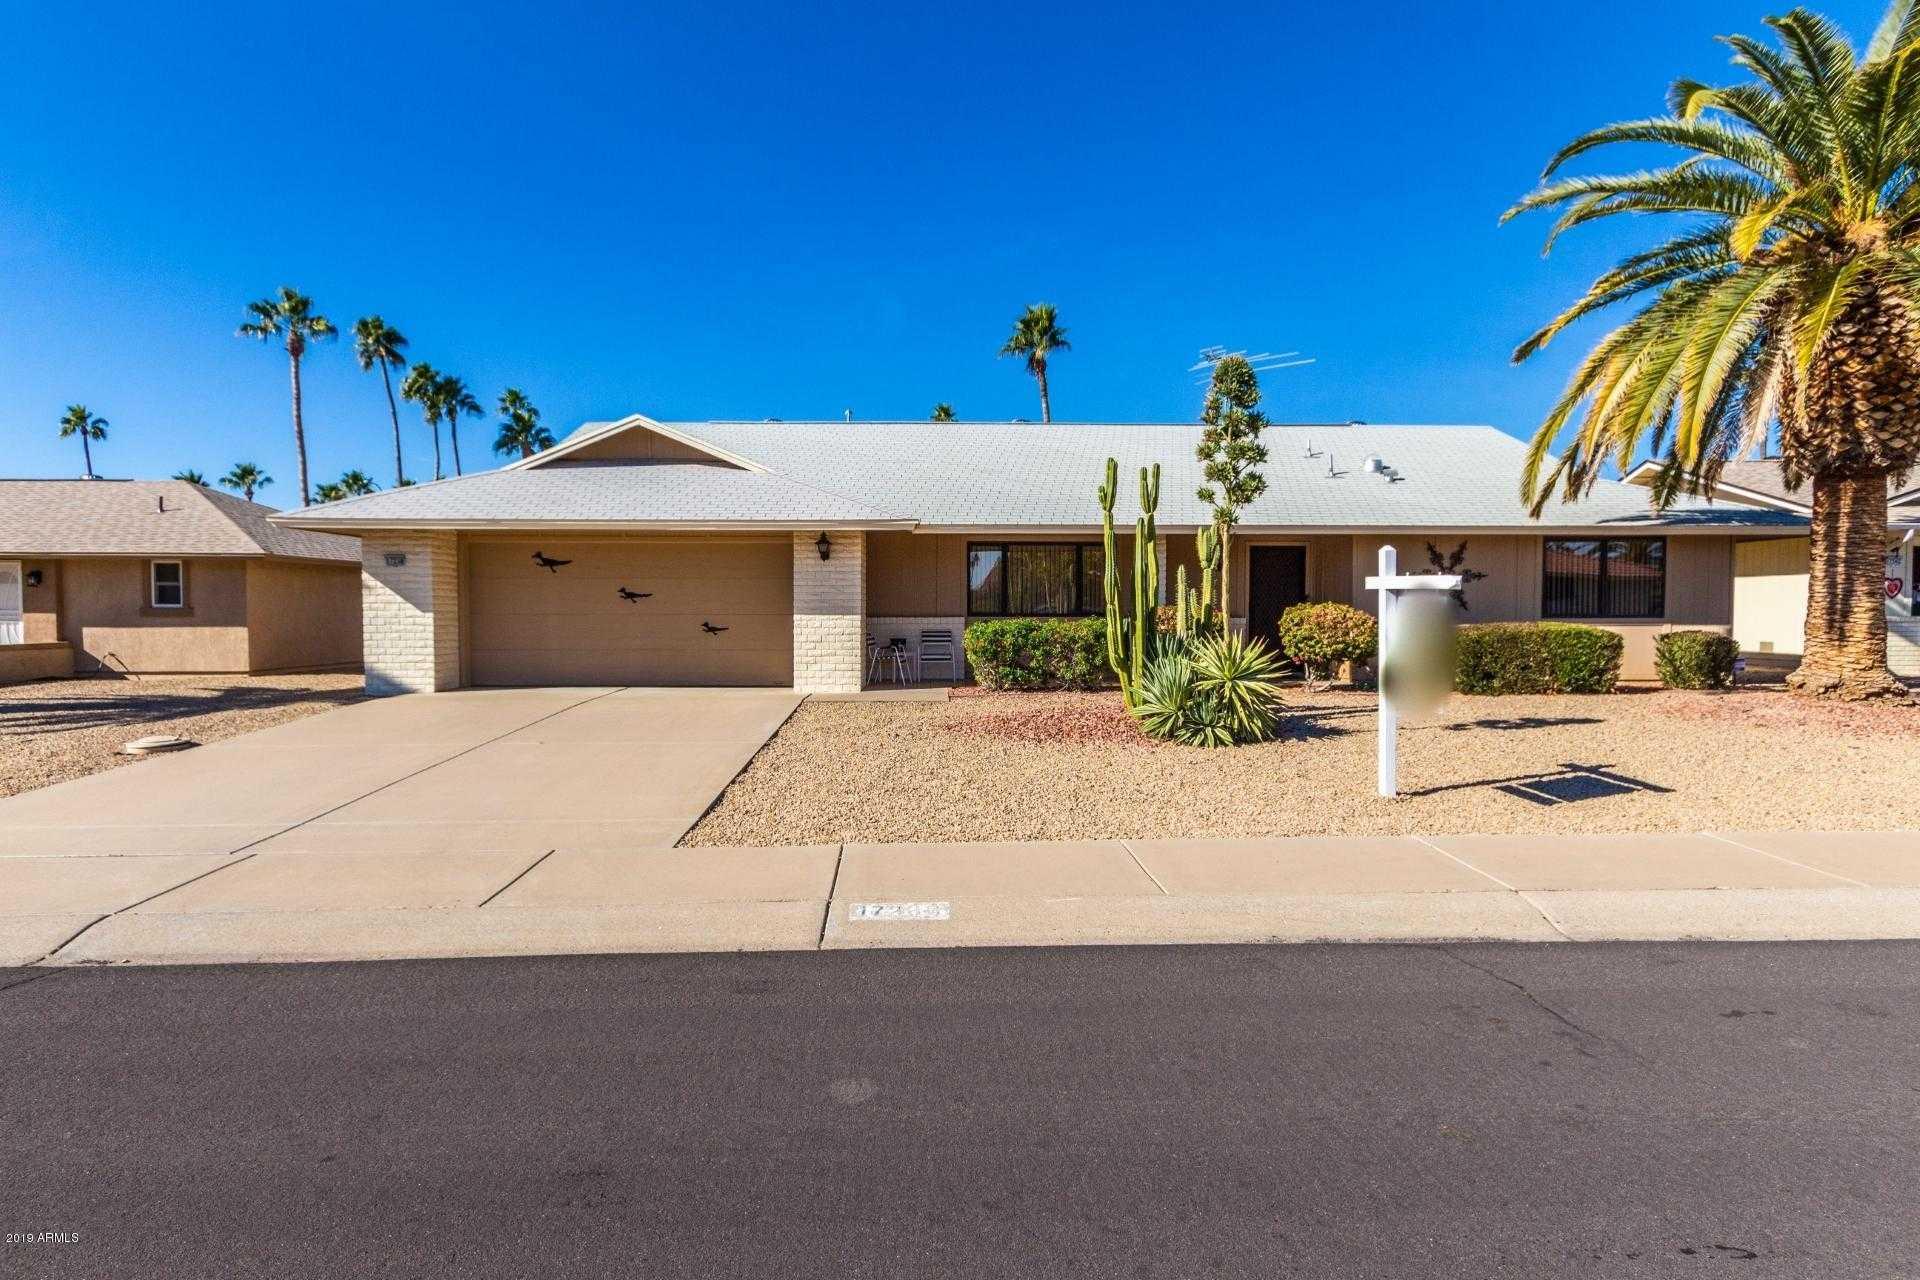 $200,000 - 2Br/2Ba - Home for Sale in Sun City West 10 Lot 1-674 & Tr A-h, Sun City West